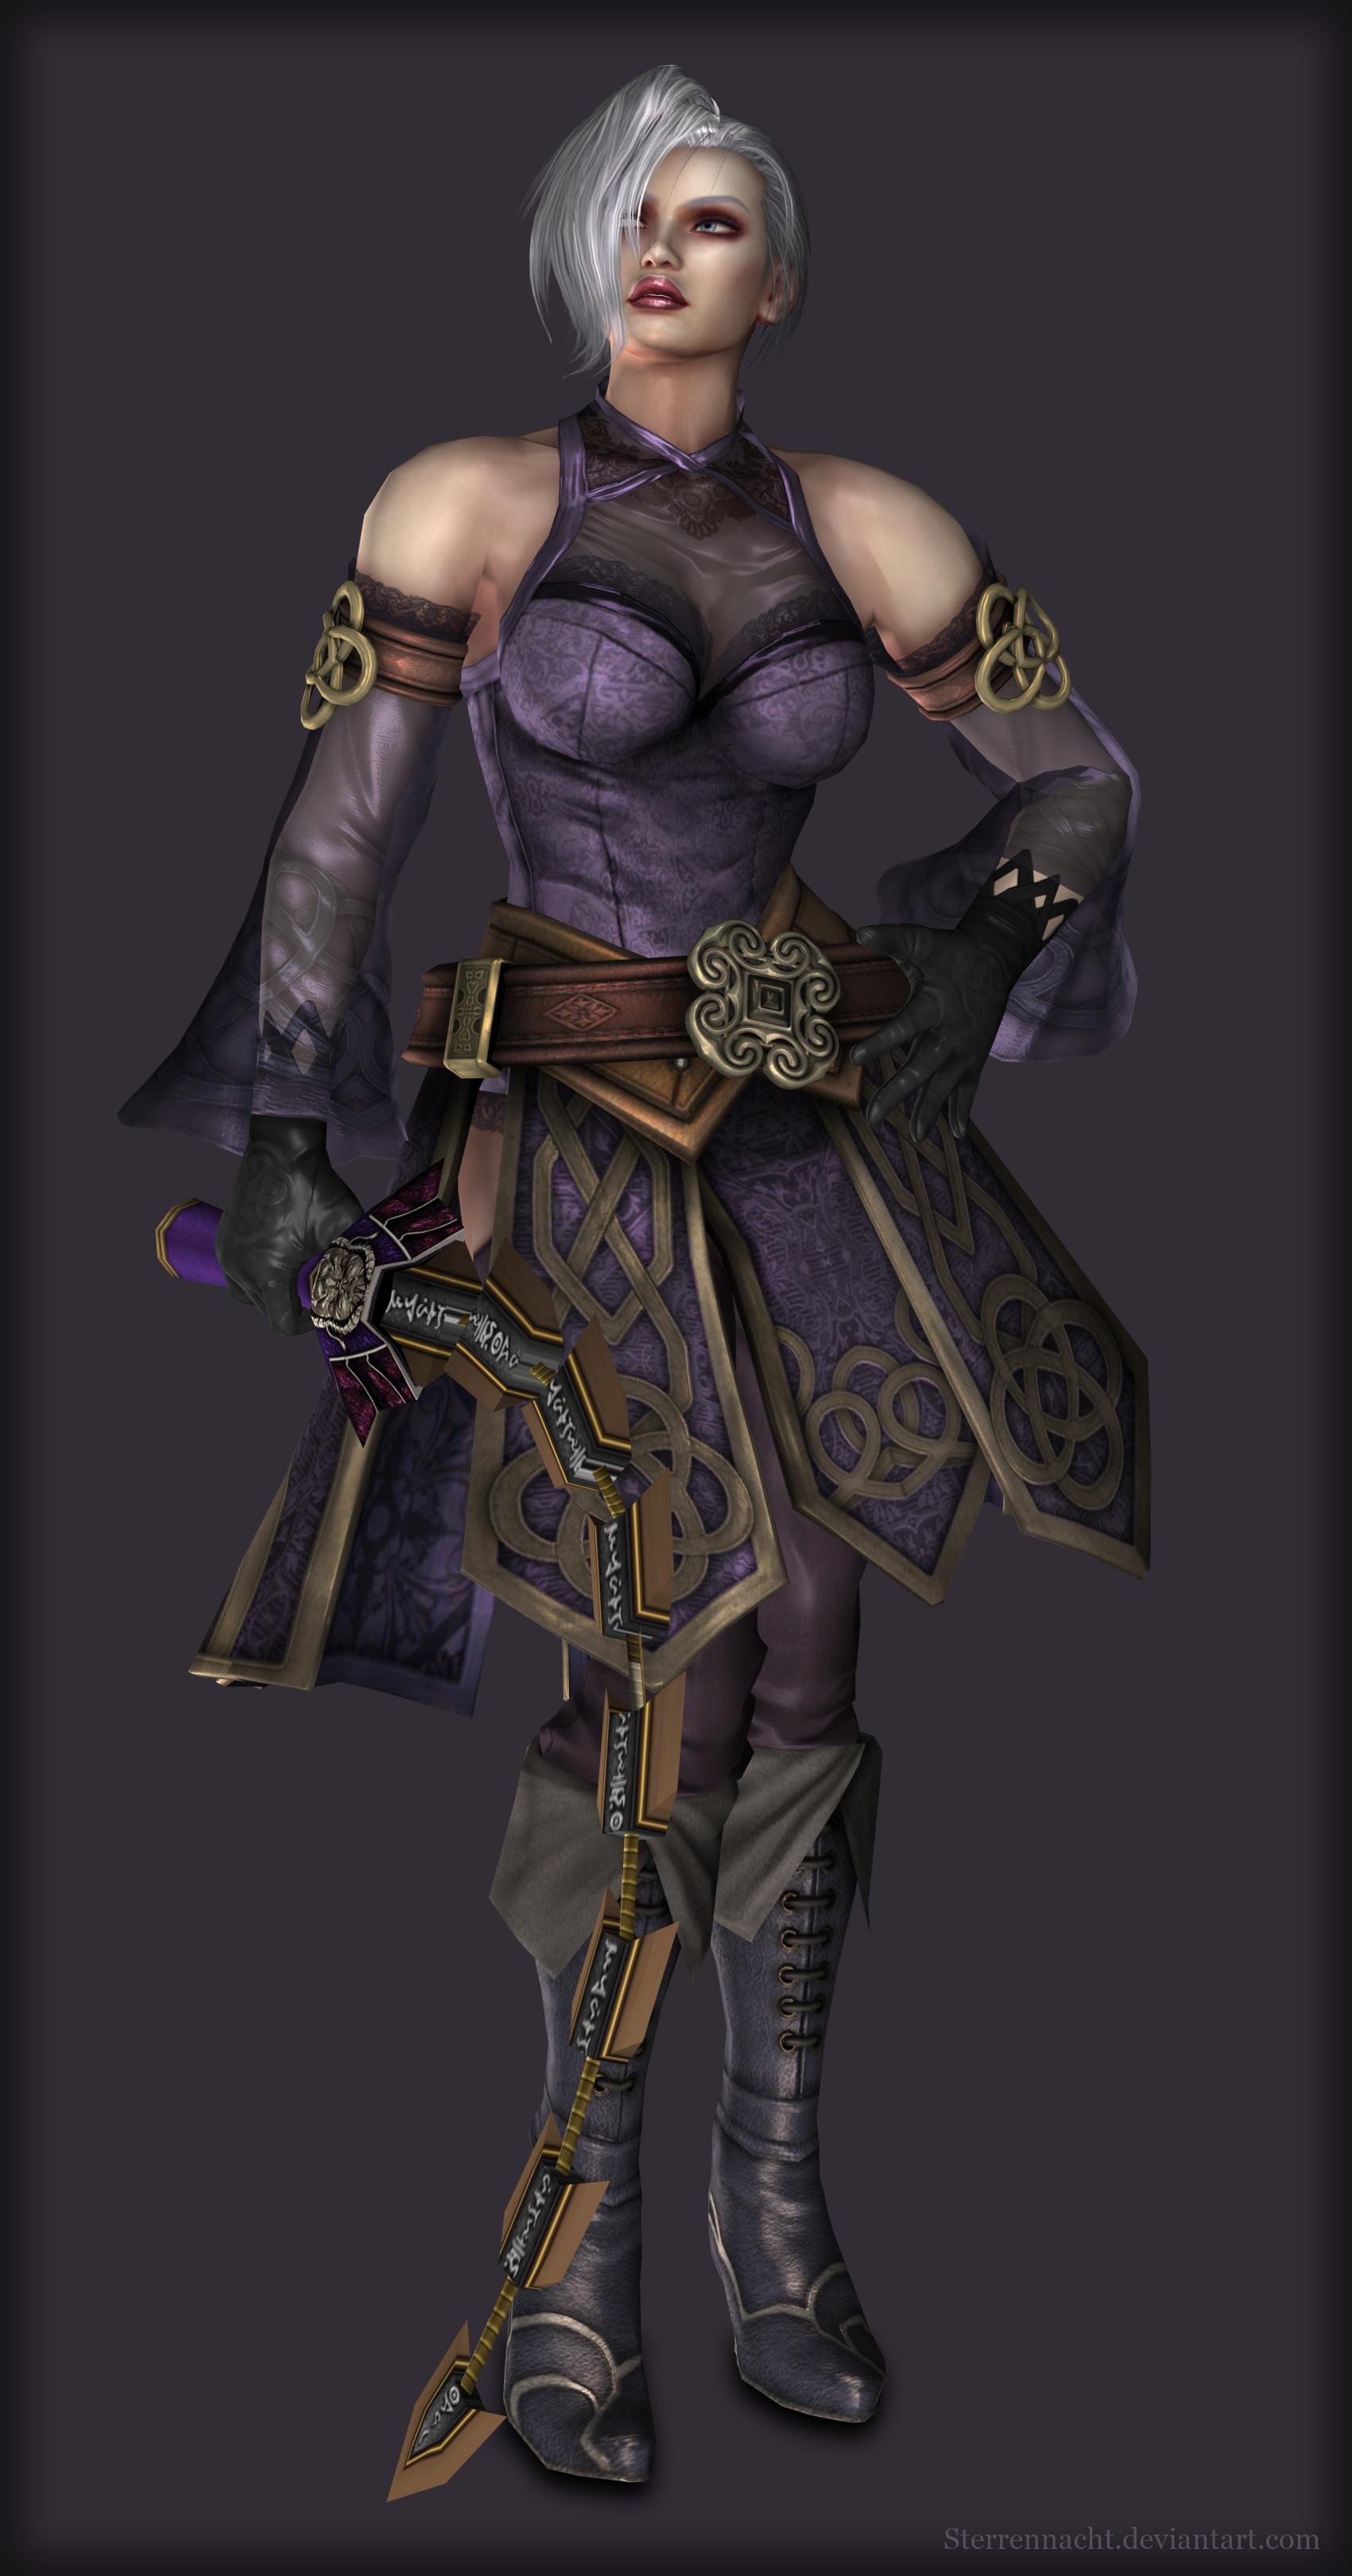 Soulcalibur IV Ivy Valentine (alternative) by